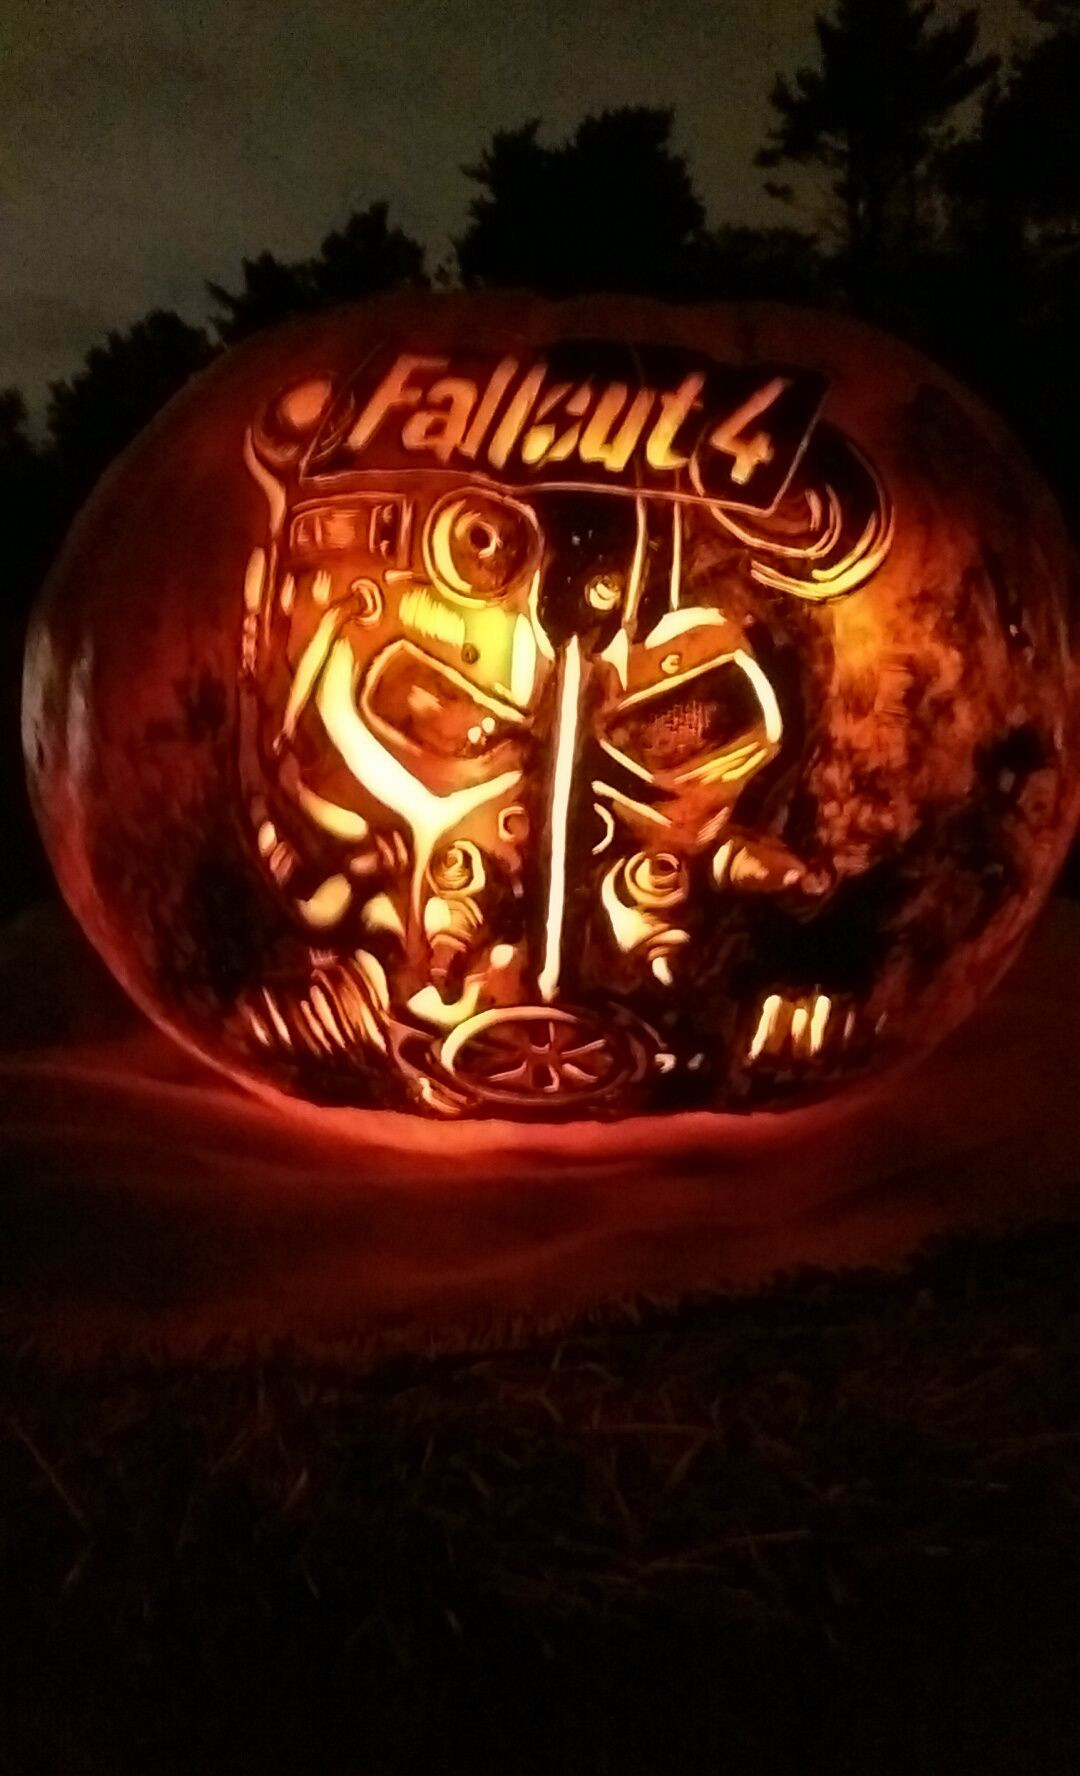 Radioactive Pumpkin Seeds Fallout 76  Fallout 4 Pumpkin Fallout Pinterest